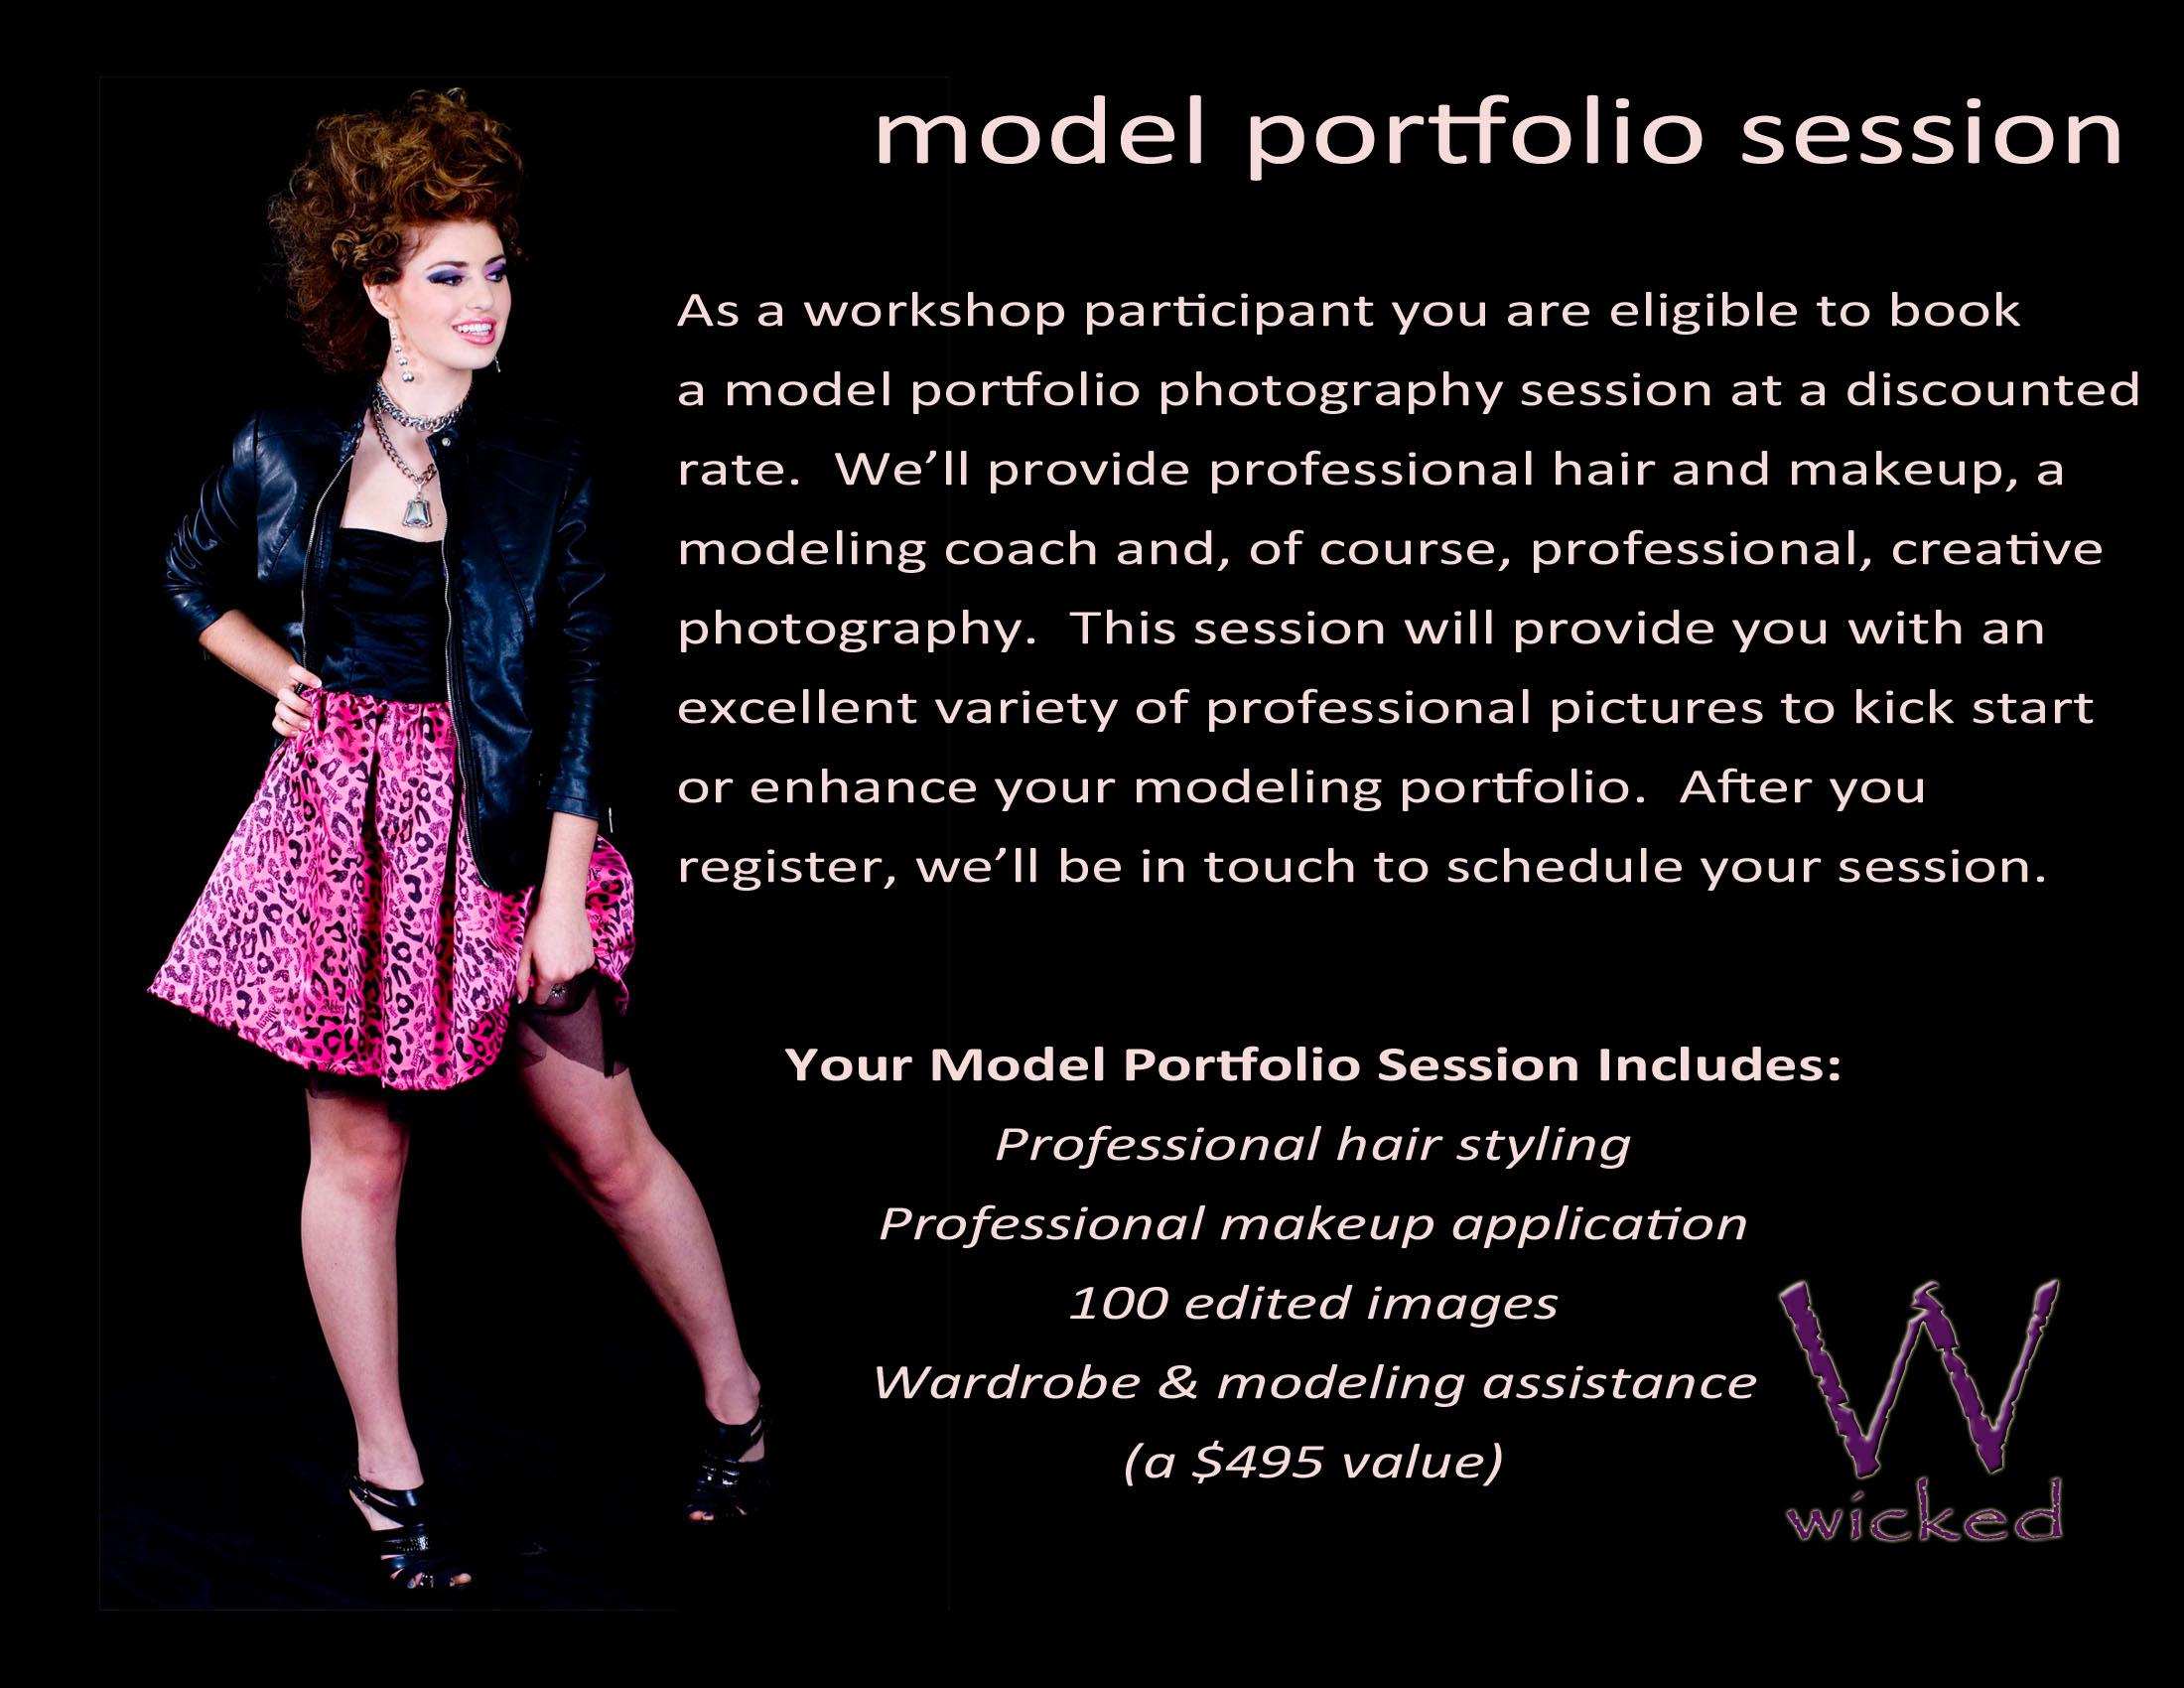 Portfolio Session Details